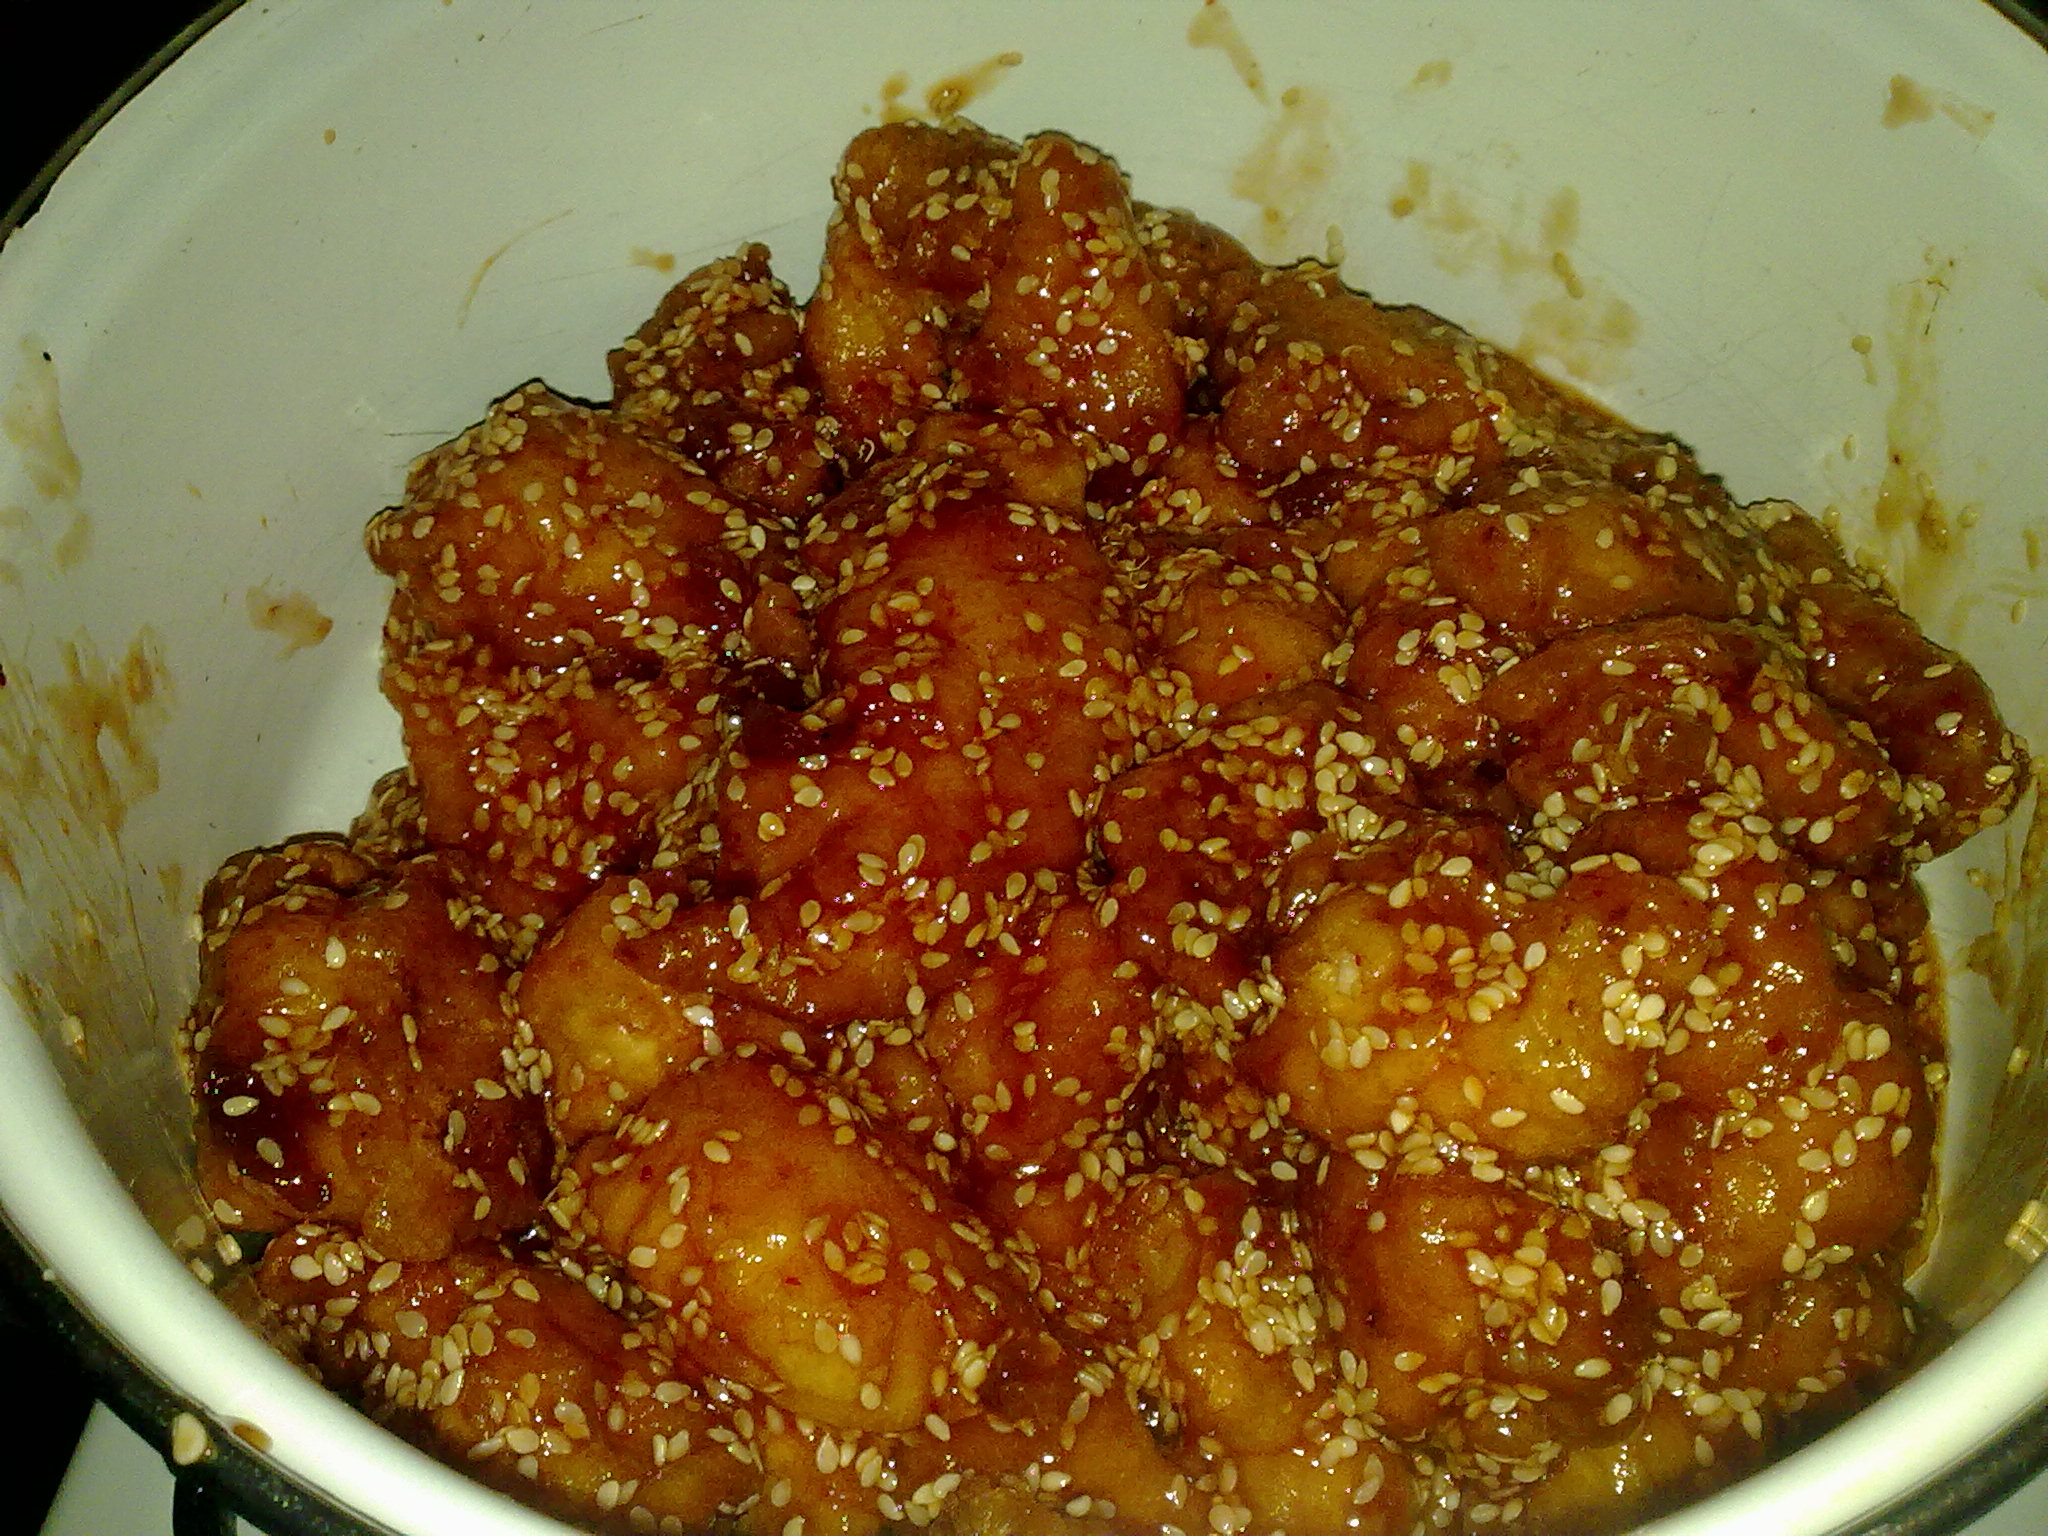 http://foodloader.net/glKz_2010-08-23_chinese_chickenwithsesame.jpg